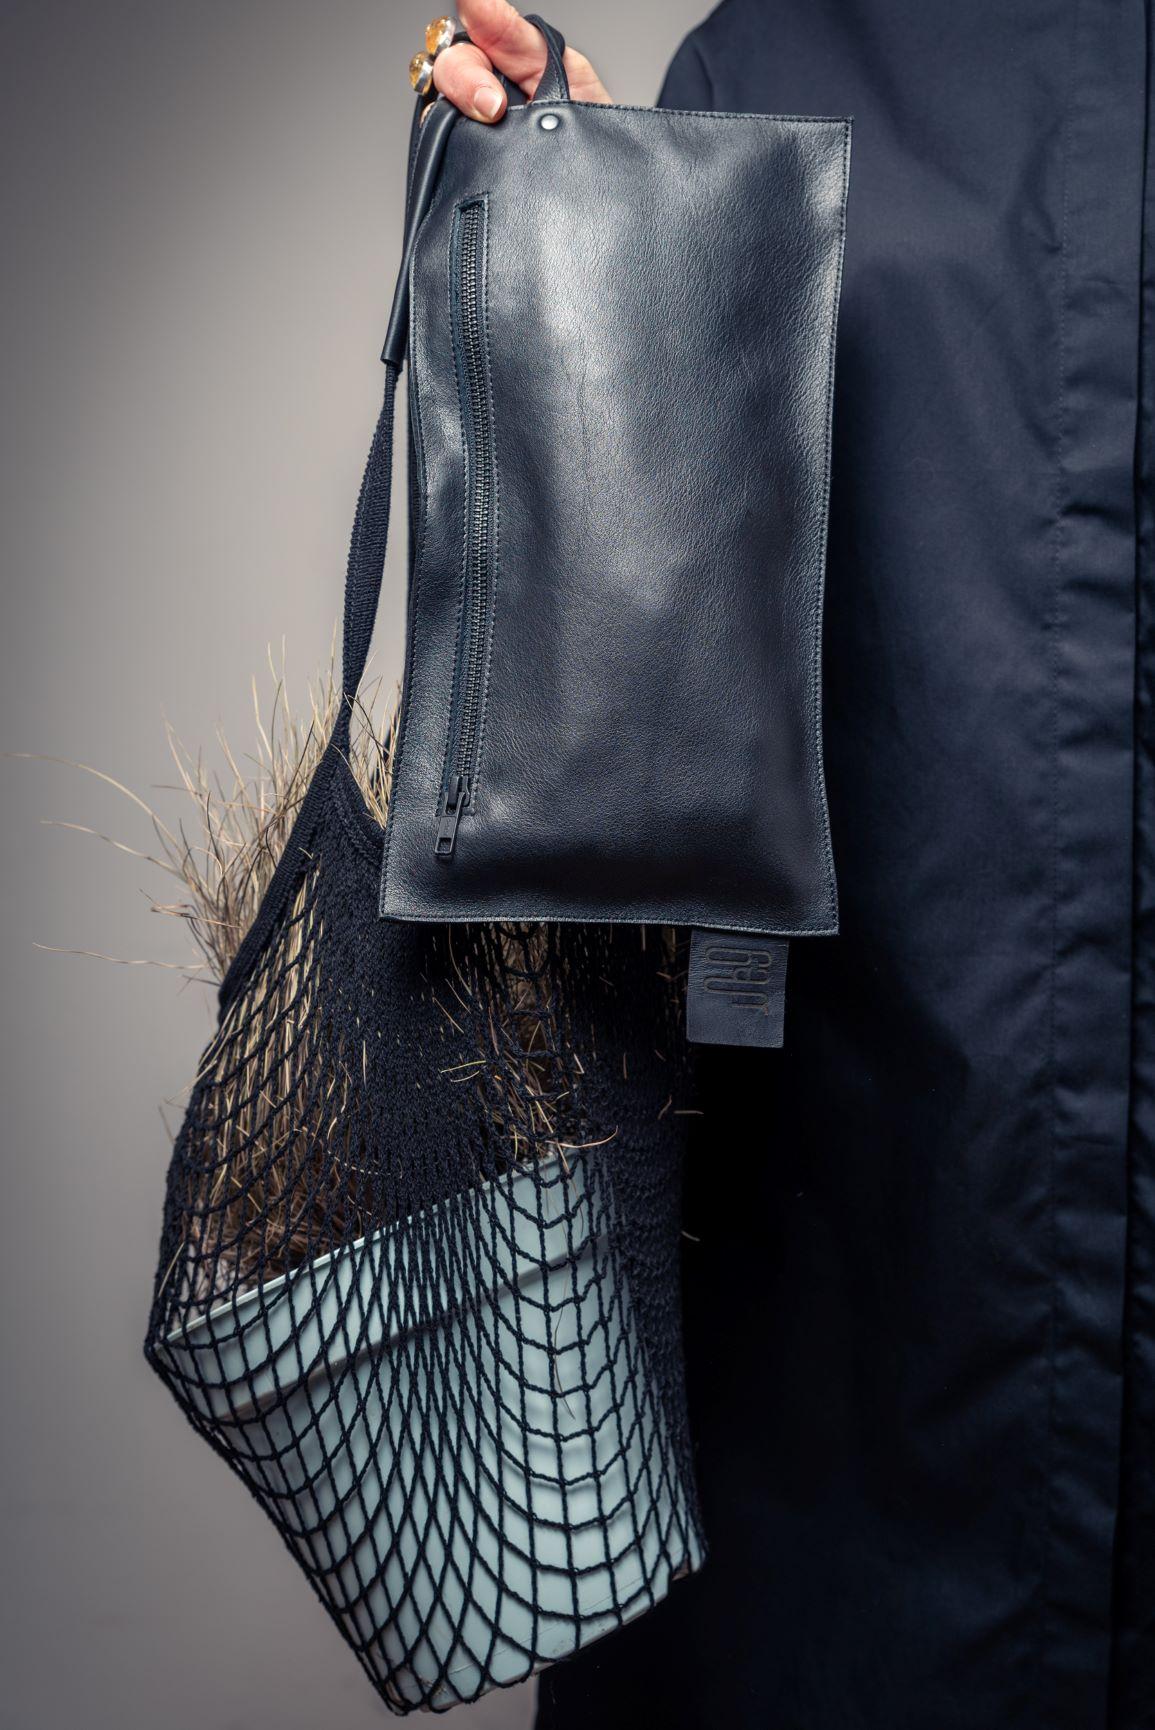 Net String Bag Black By June9Concept